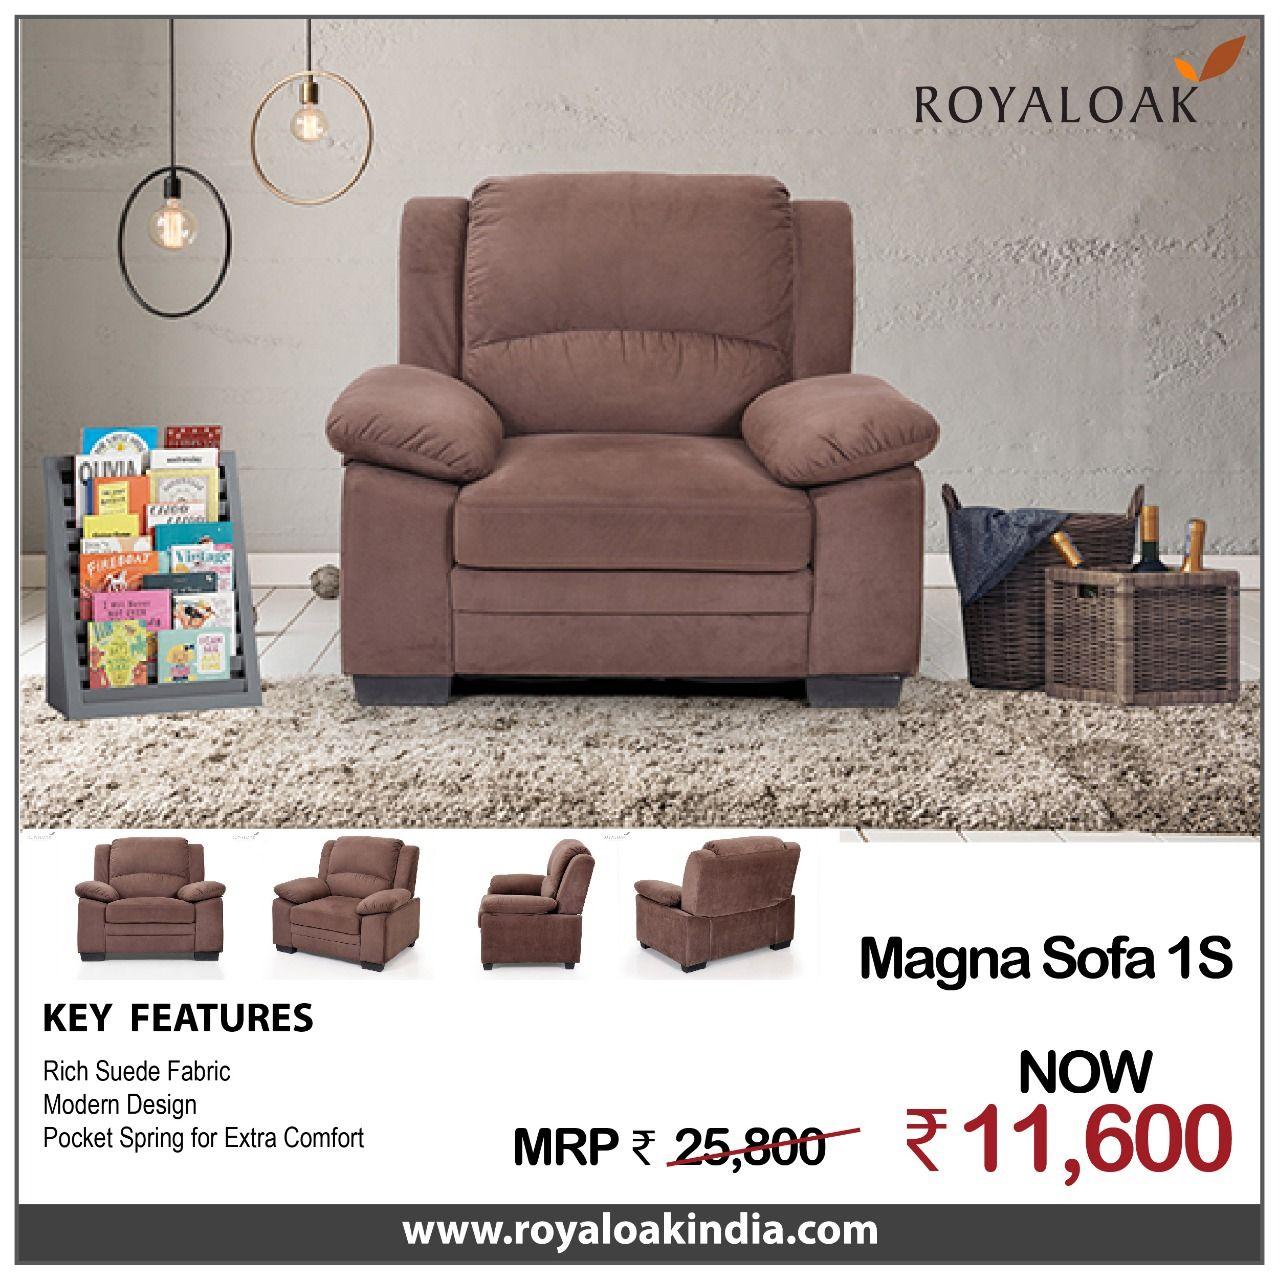 Pin By Royaloak Furniture On Royaloak Single Seater Sofas Buy Sofa Online Buy Sofa Single Seater Sofa